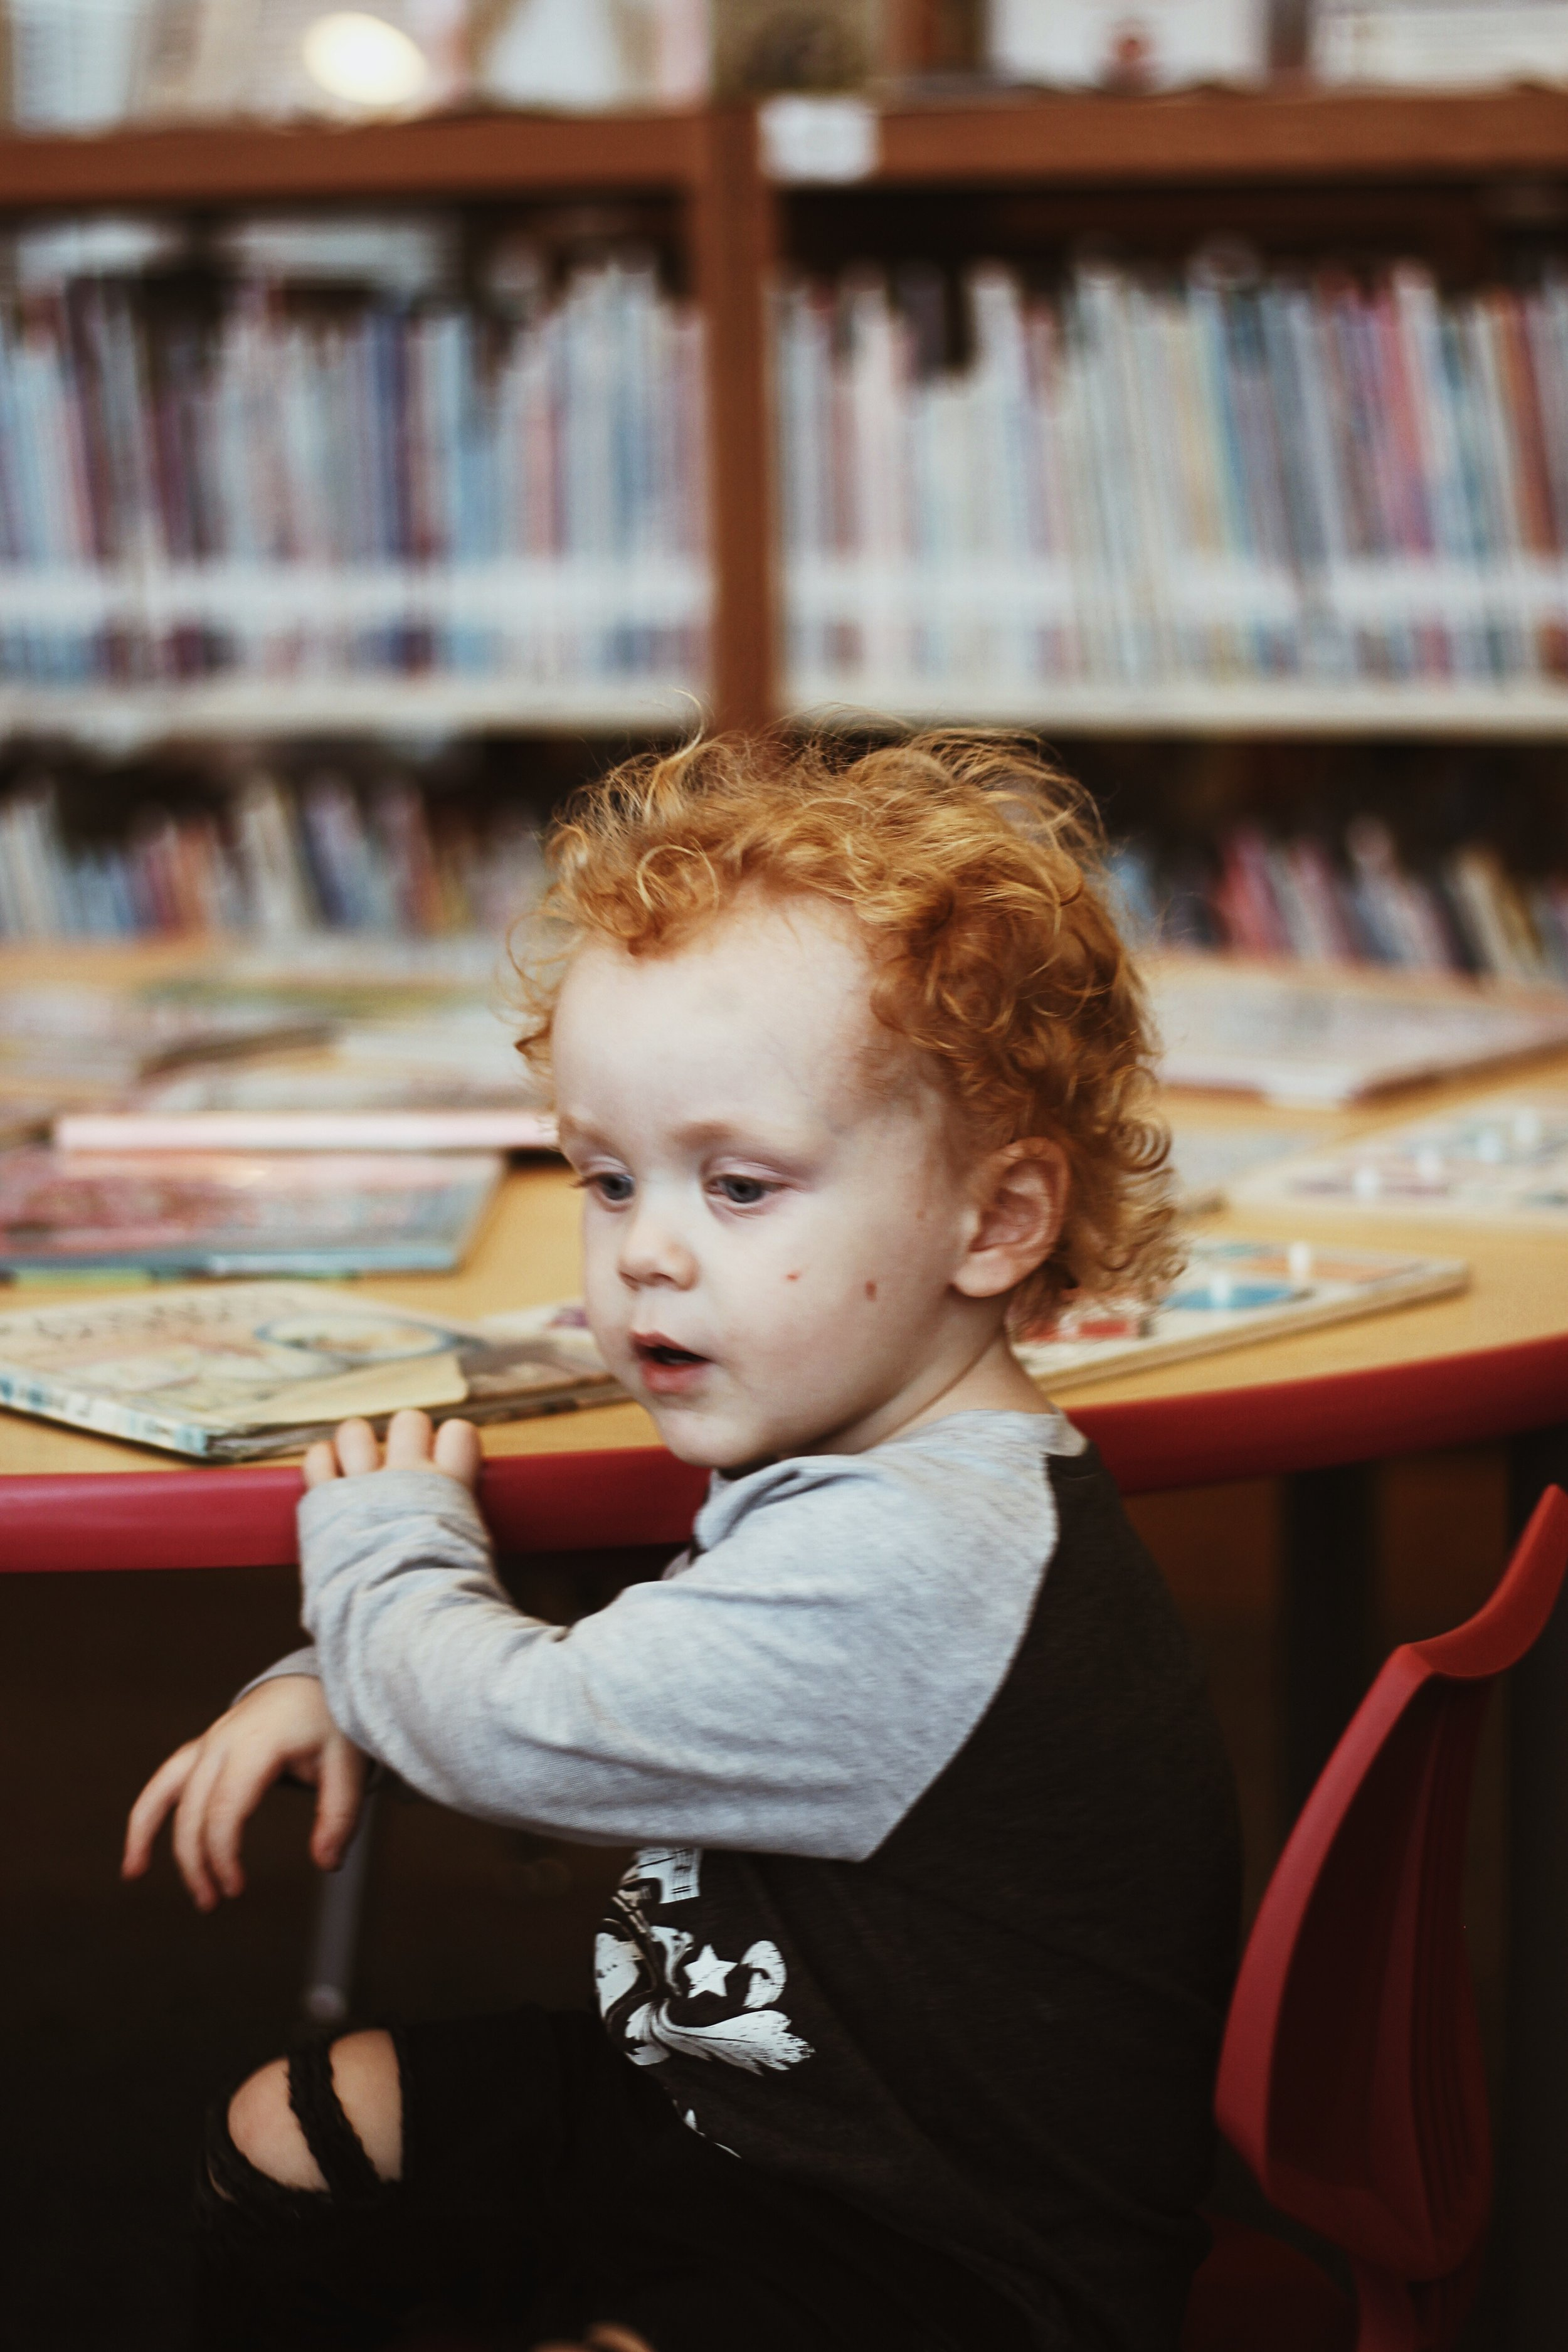 Rainy Days at the Library